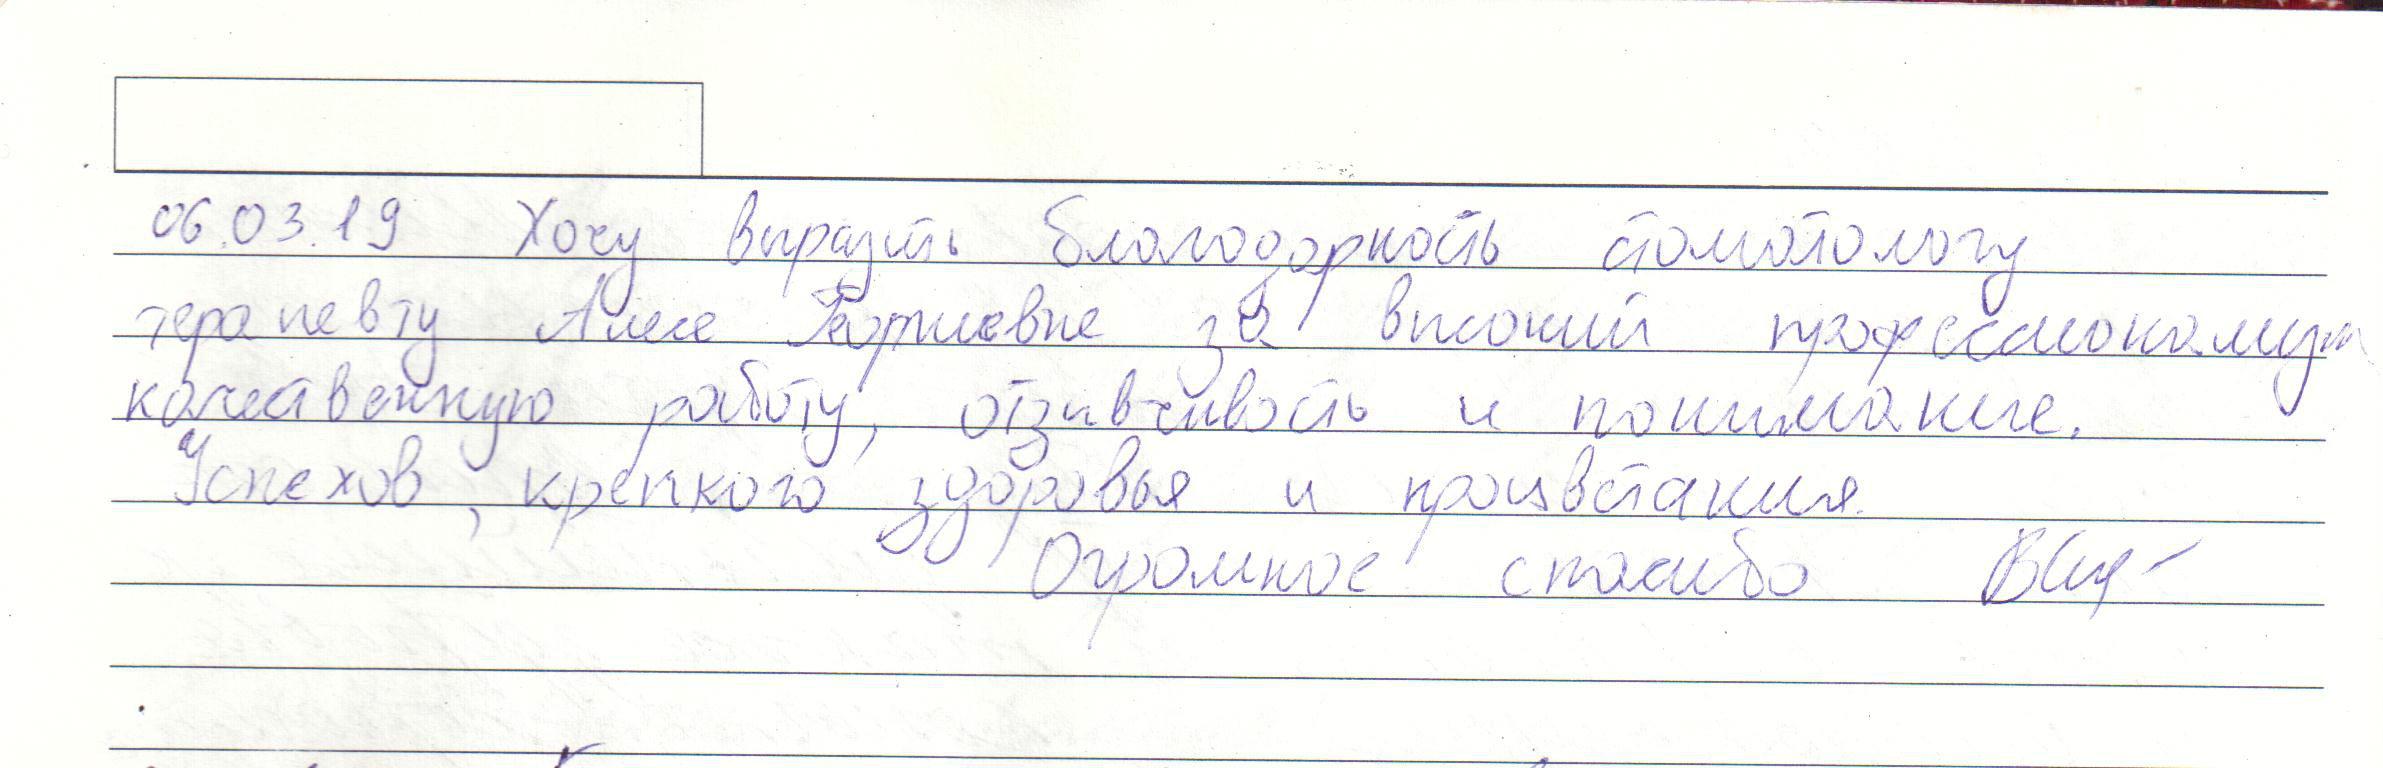 Благодарность стоматологу Алесе Георгиевне